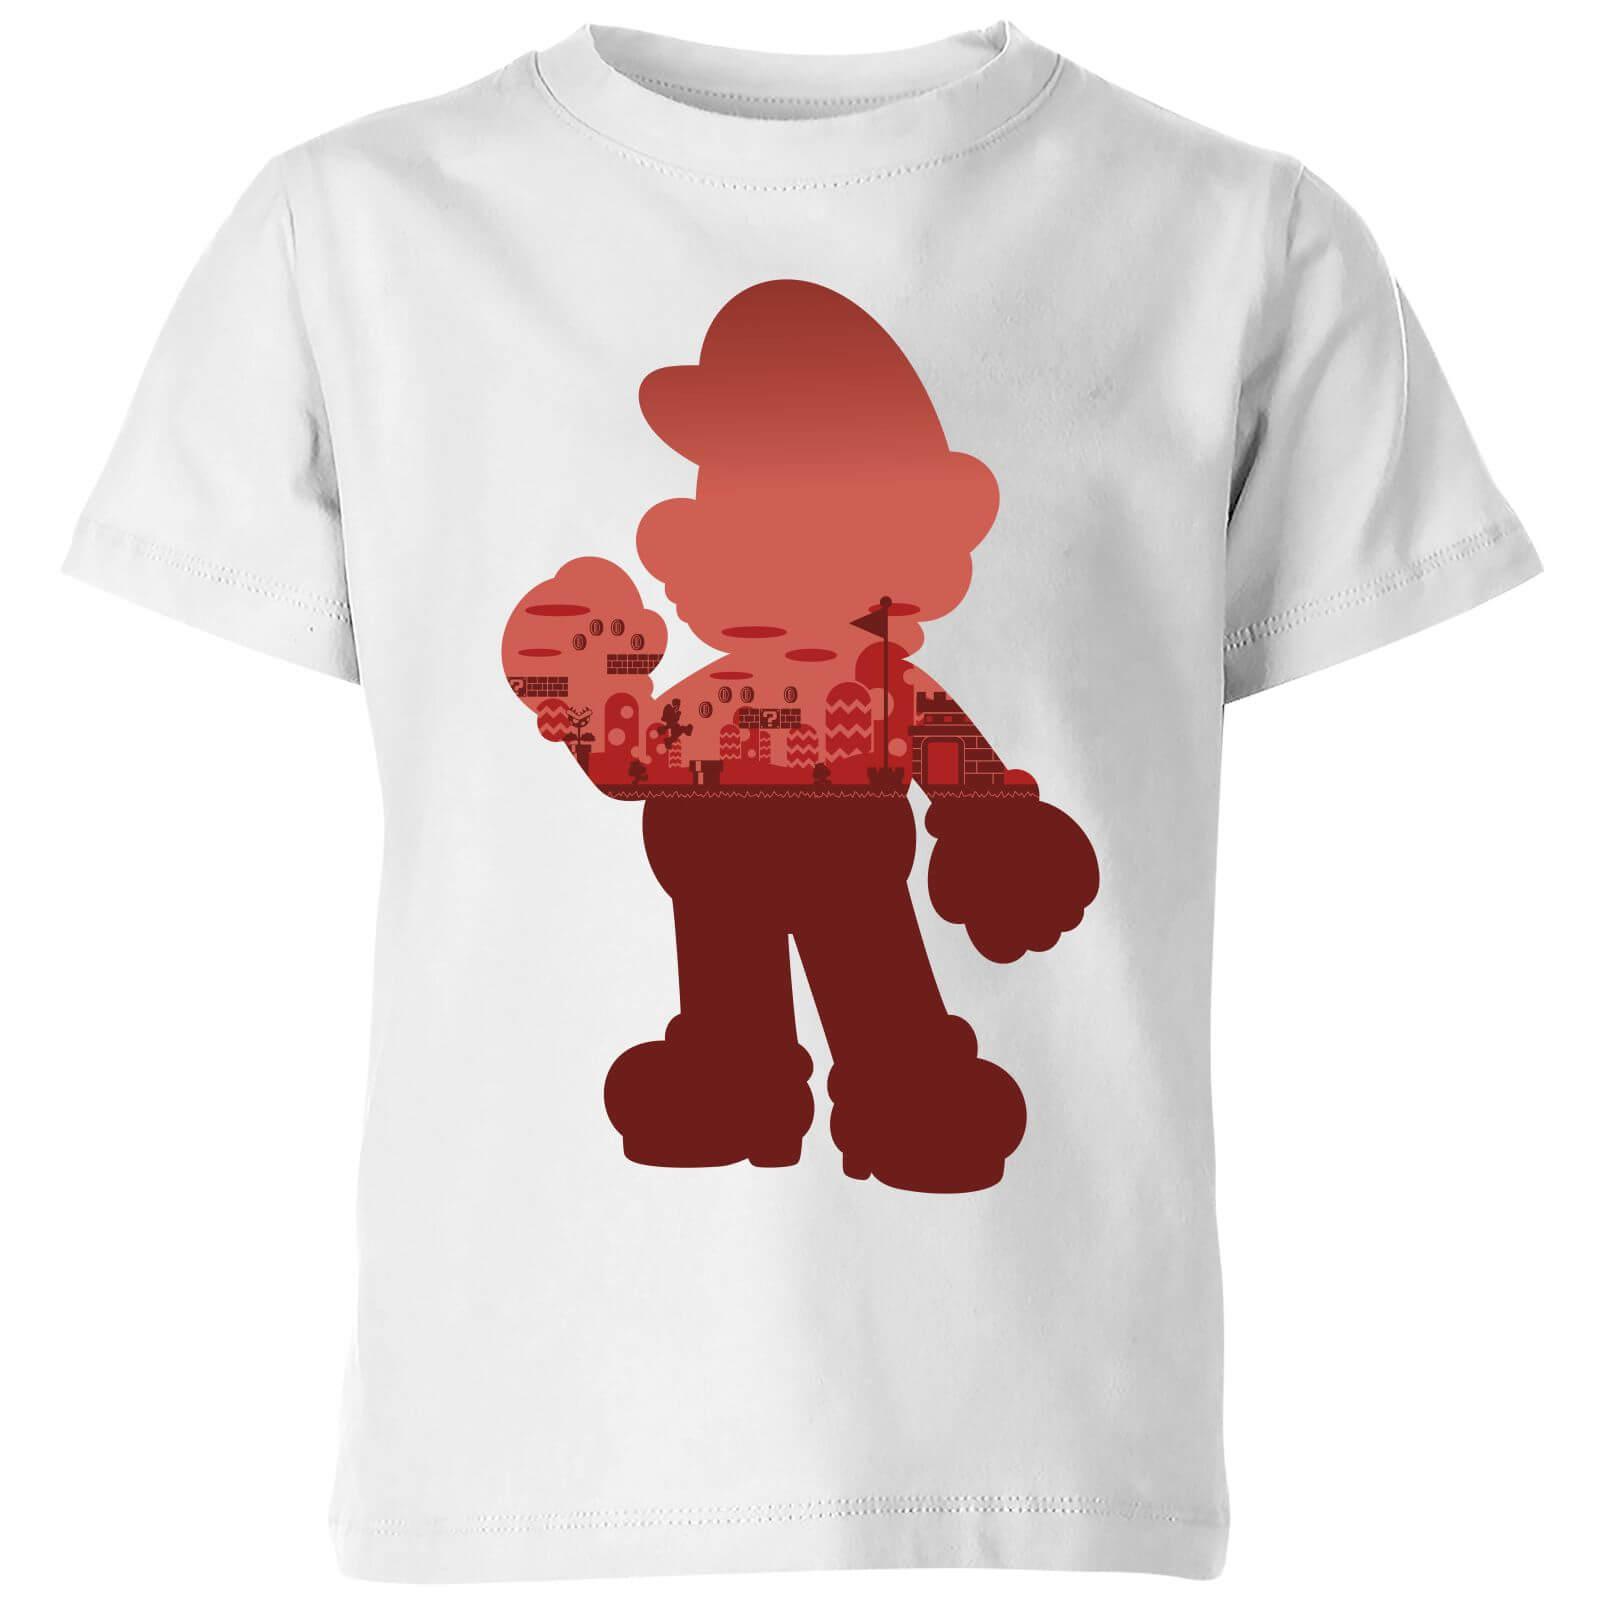 Image of T-Shirt Nintendo Super Mario Mario Silhouette - Bianco - Bambini - 3-4 Anni